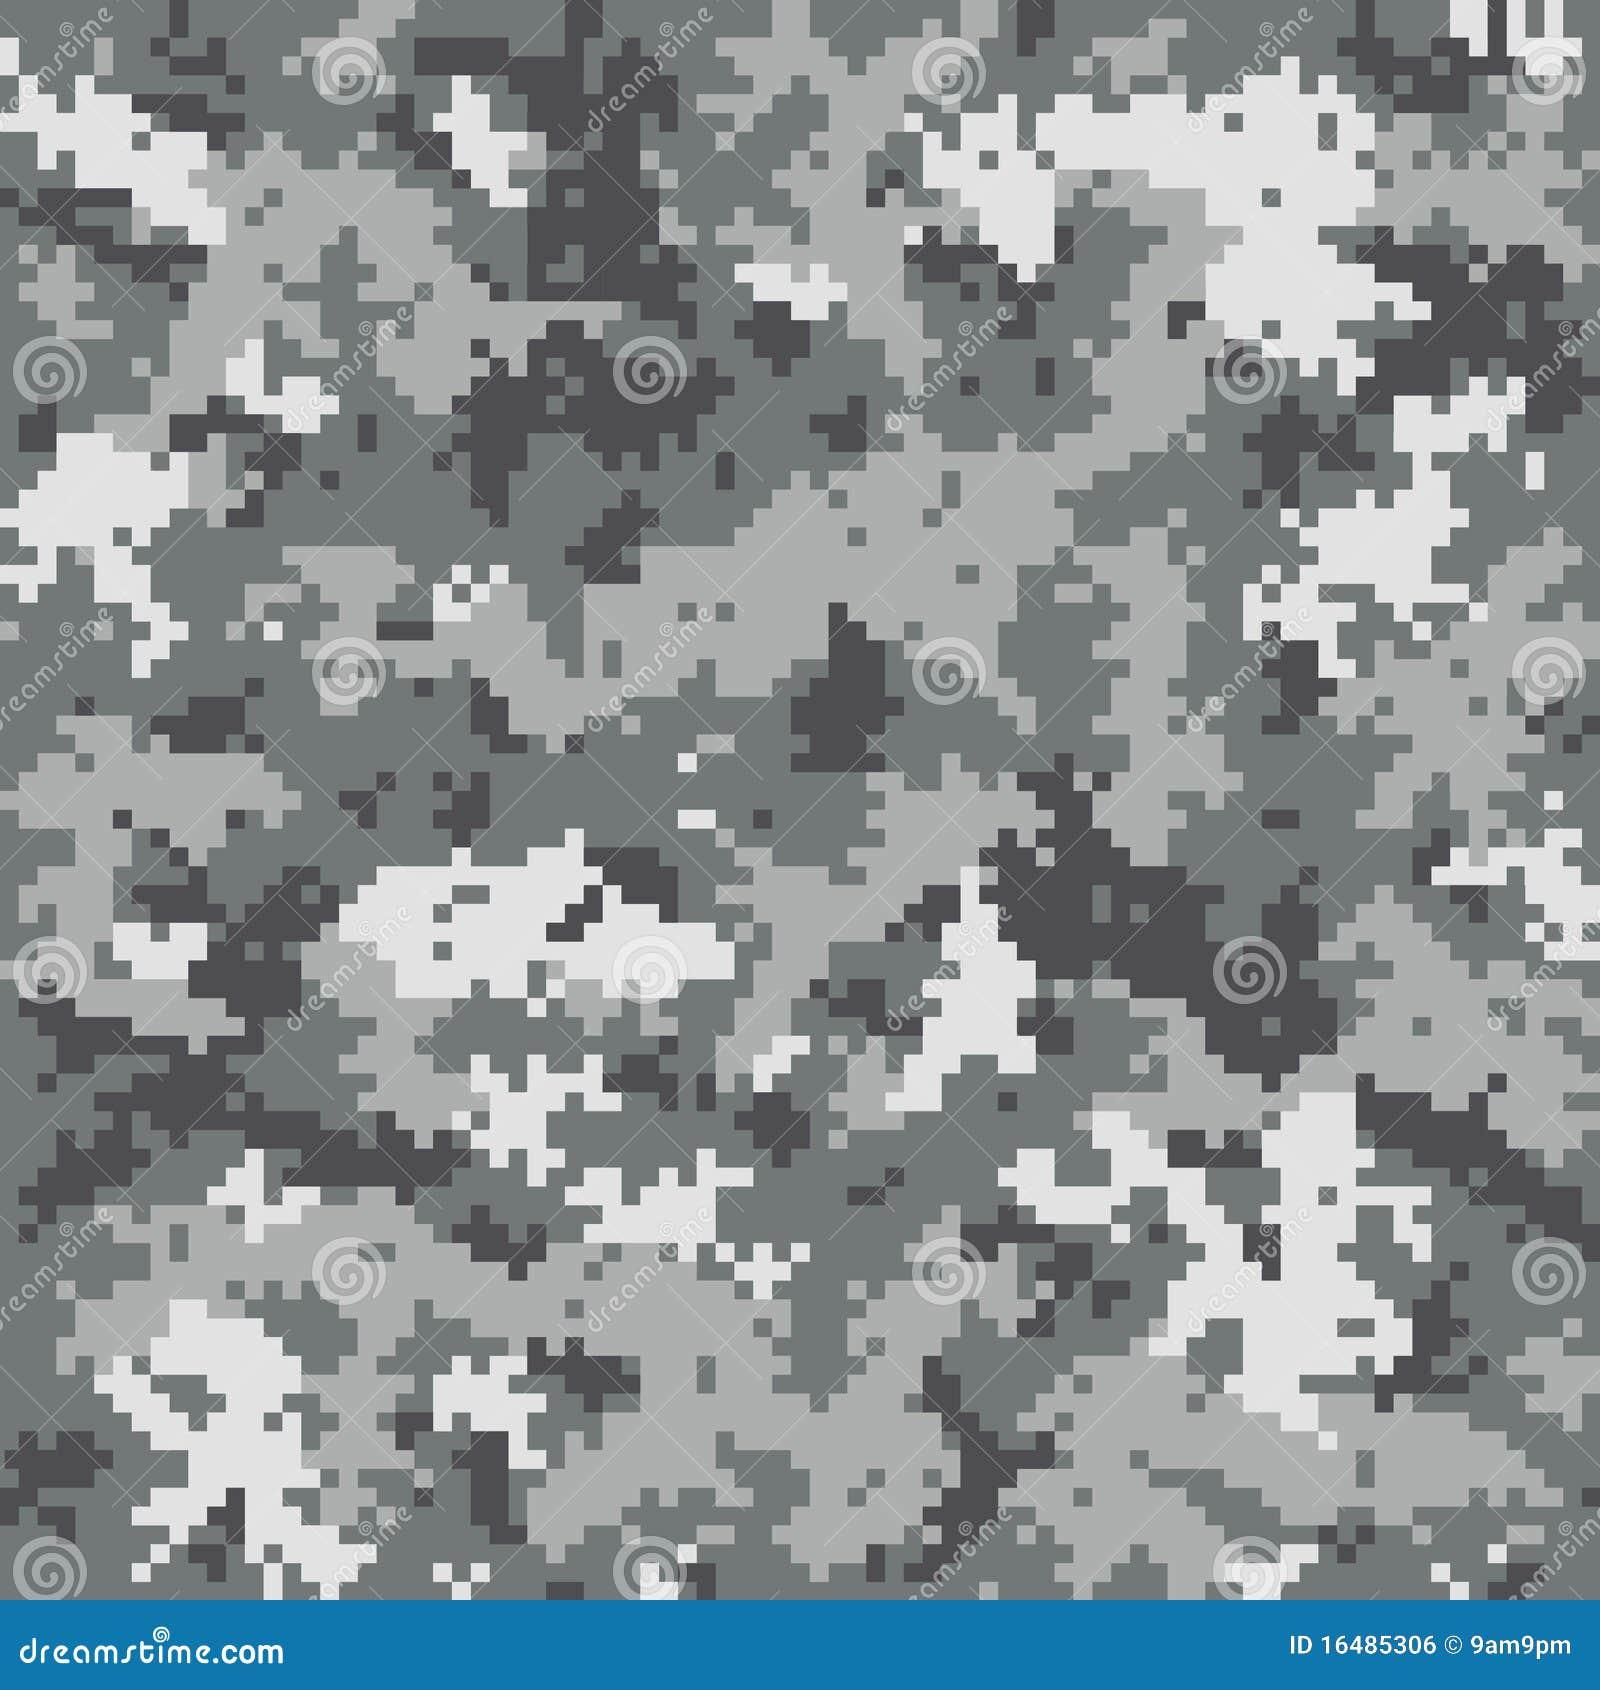 Digital camouflage pattern  U.s. Army Digital Camouflage Pattern